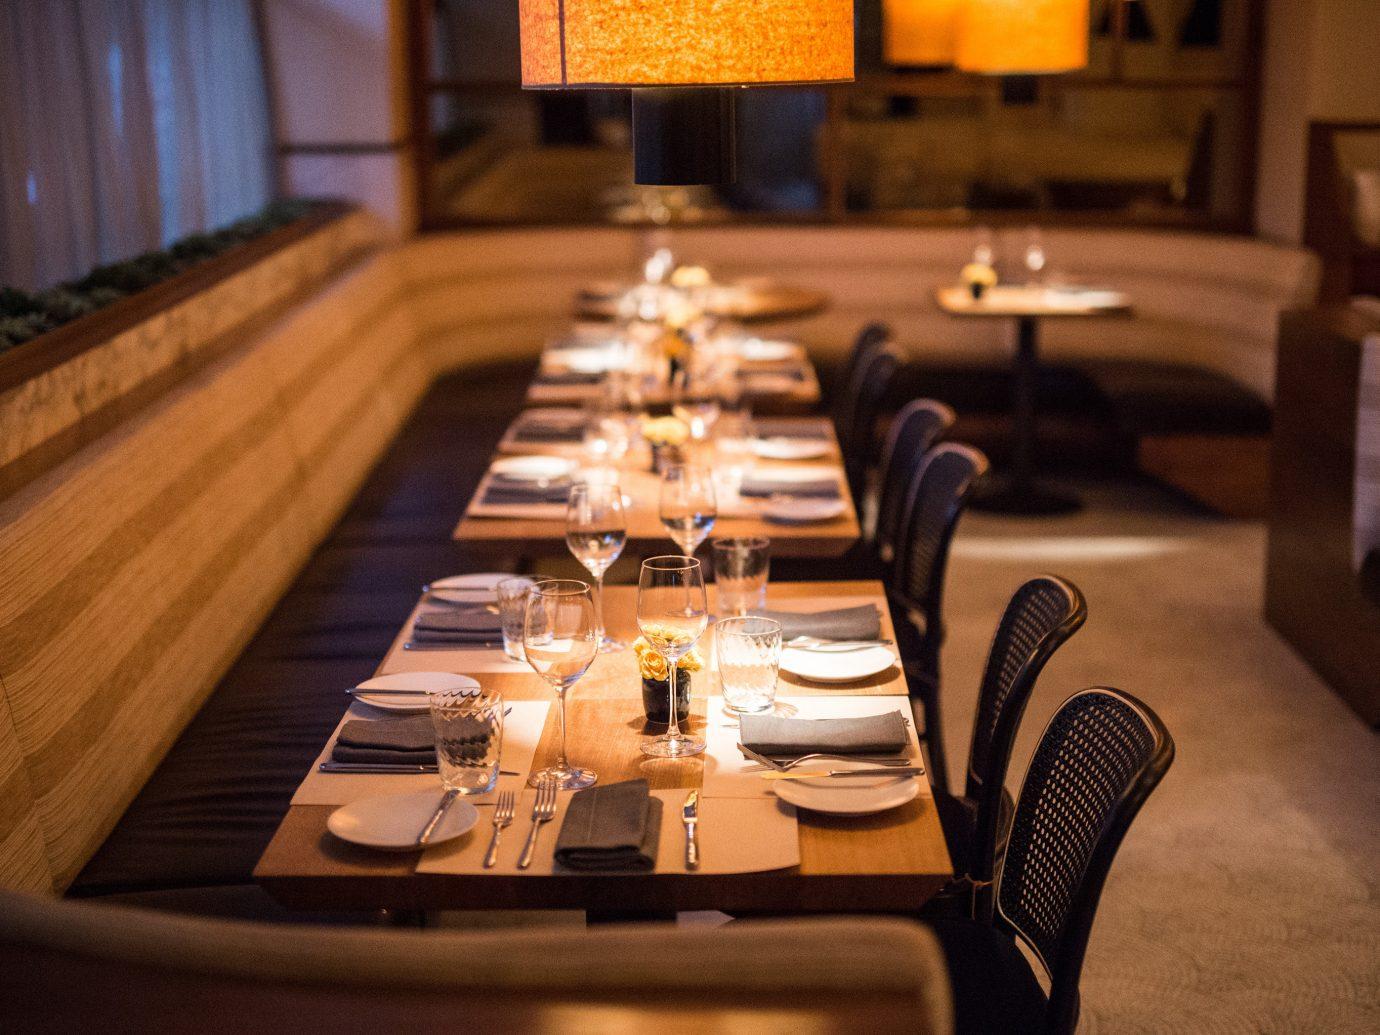 Food + Drink Romance table indoor room meal restaurant function hall interior design Design